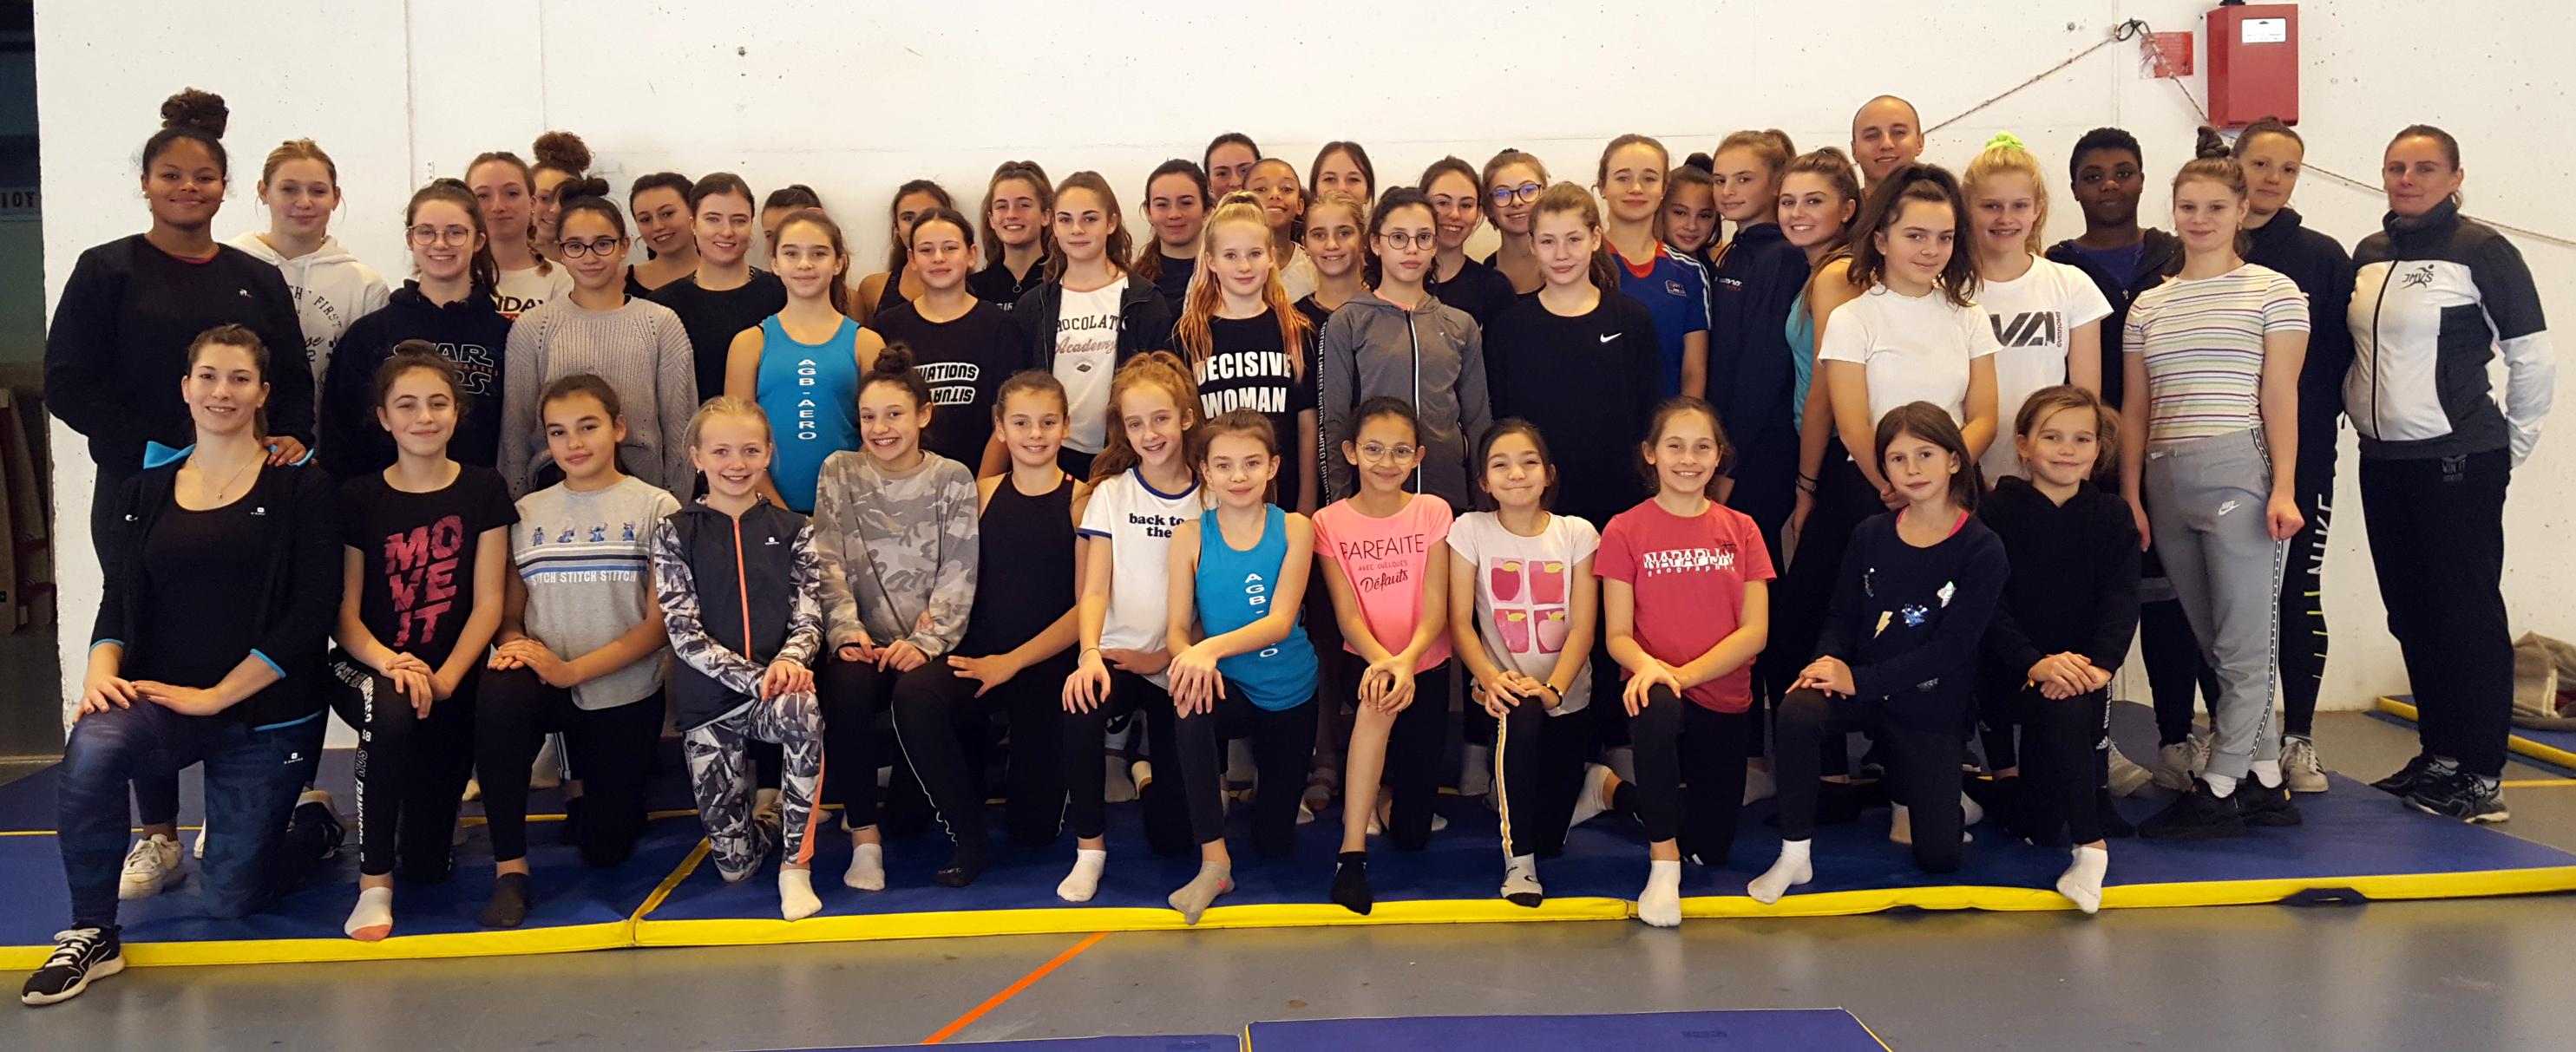 AER : Regroupement de gymnastes du 17 novembre 2019